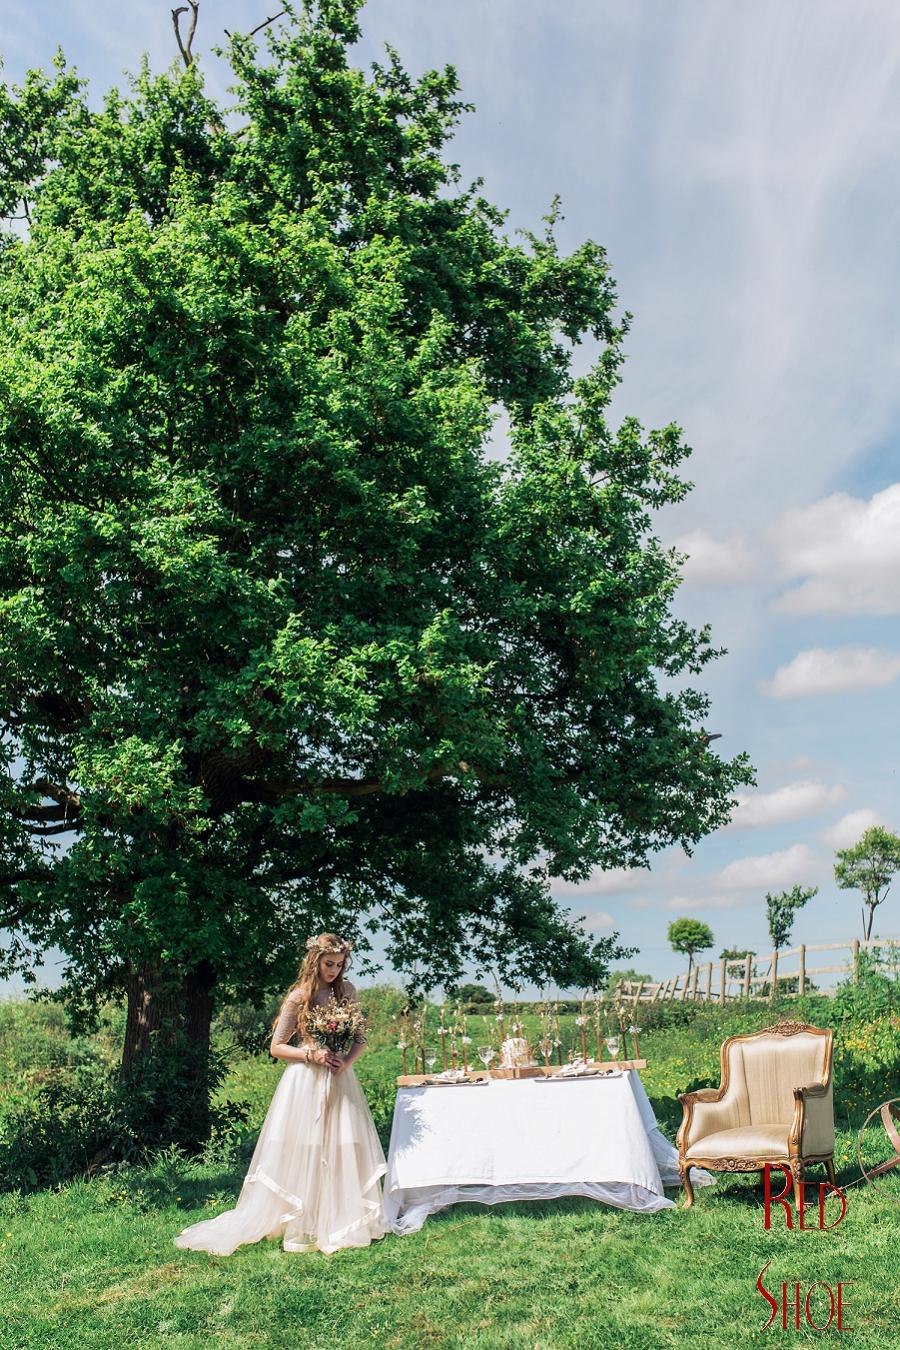 Boho bride, Glam Boho bride, Wedding inspiration, Styled wedding photo shoot, wedding ideas, wedding flower ideas, wedding photography, dried wedding flowers, boho bride makeup ideas_0079.jpg